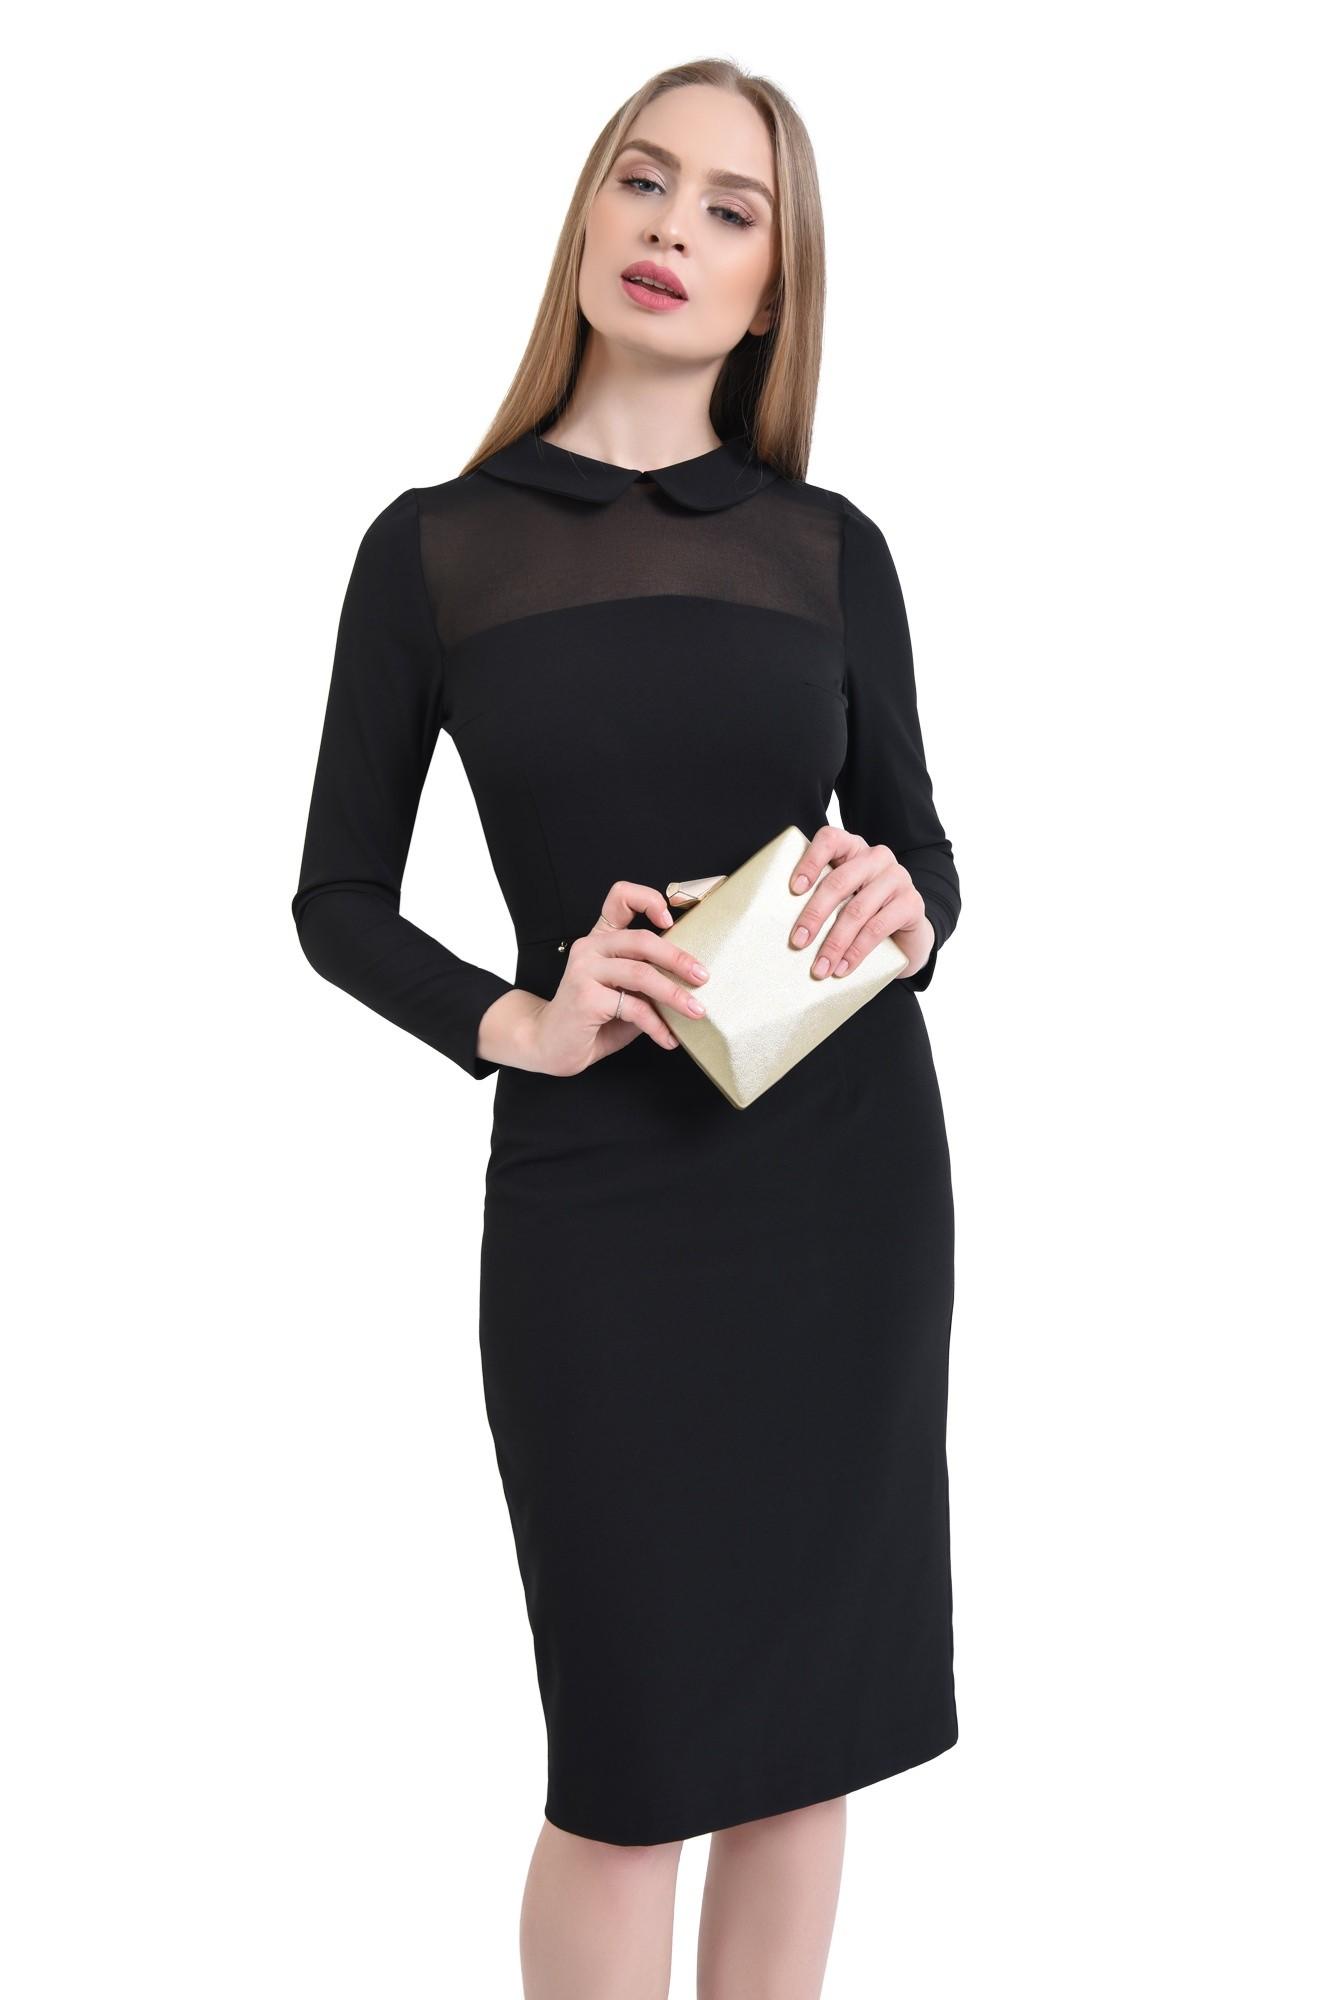 0 - rochie eleganta, midi, conica, guler rotunjit